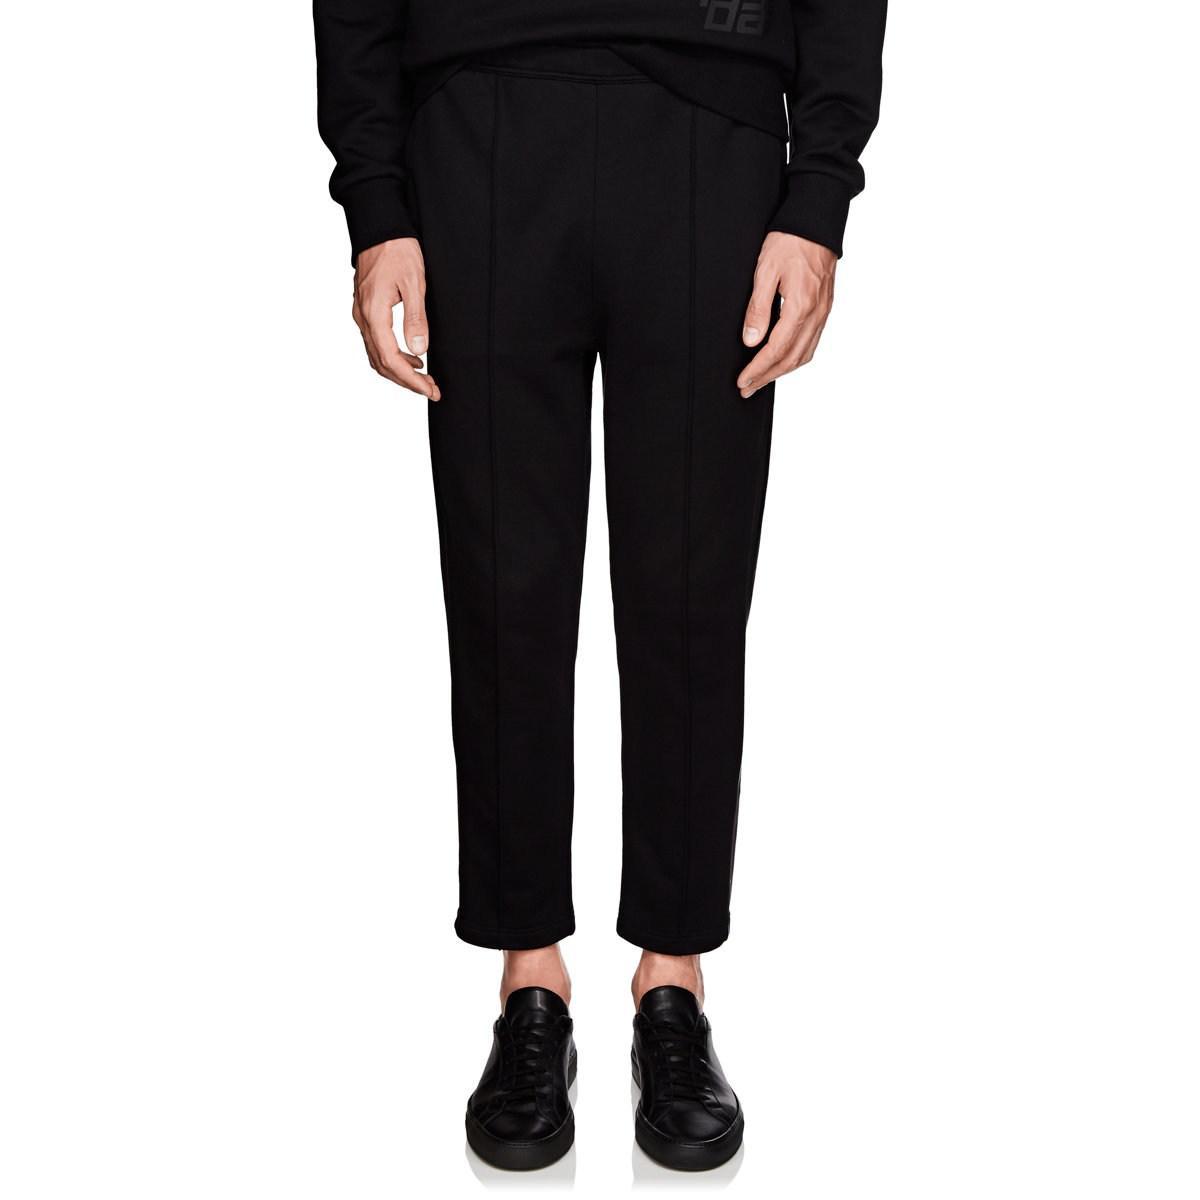 17f2c64e49ac Lyst - Prada Taped-striped Cotton Sweatpants in Black for Men